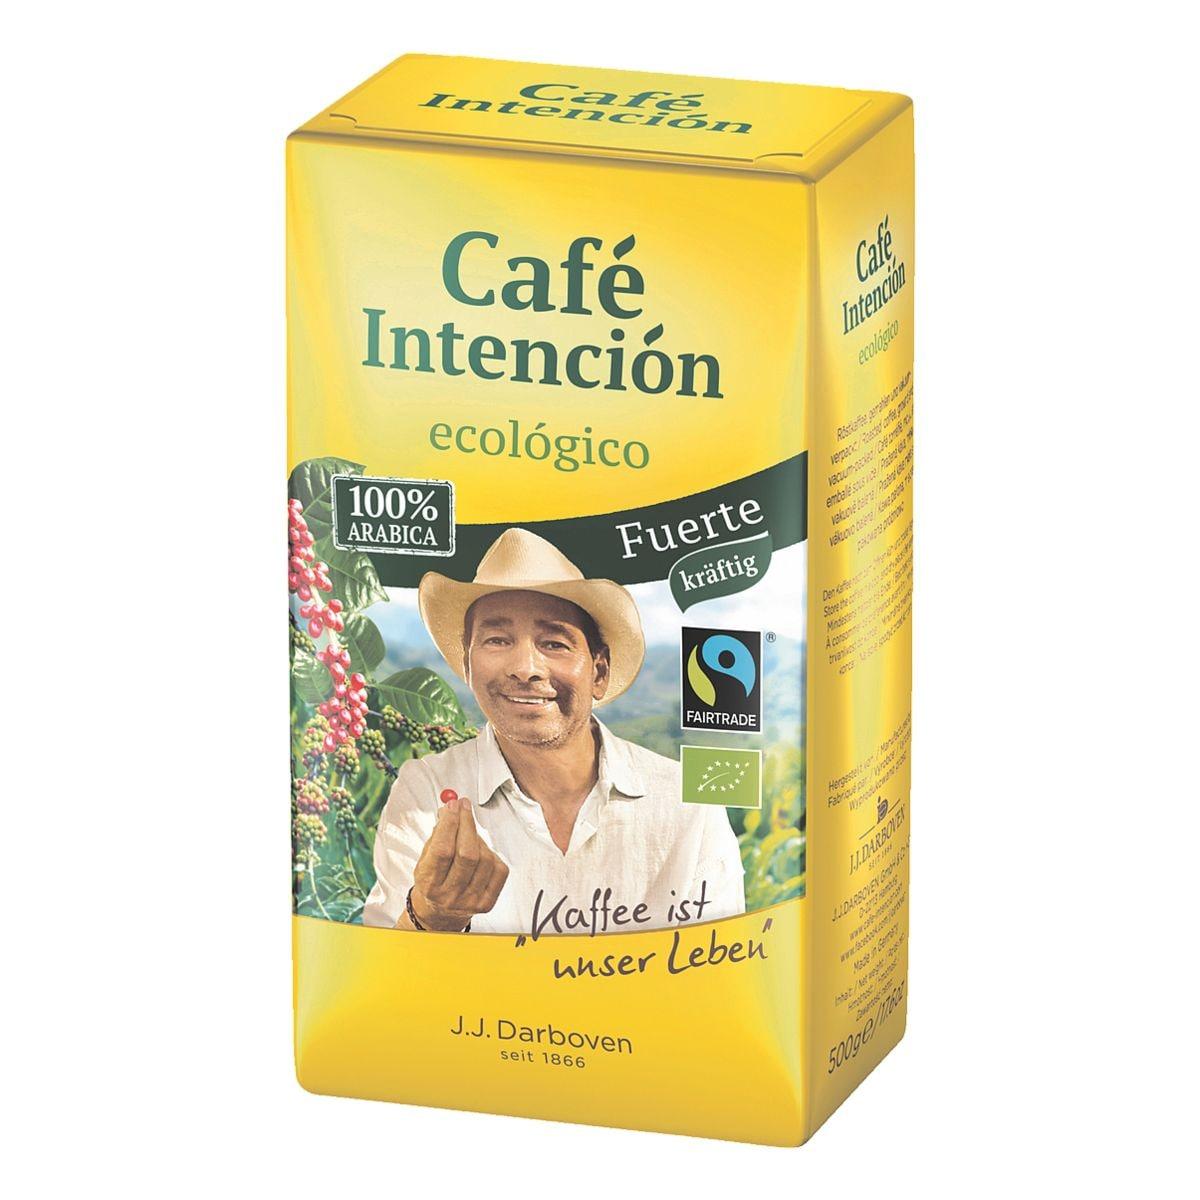 JJ.Darboven Bio-Kaffee »Café Intención ecológico Fuerte« - gemahlen